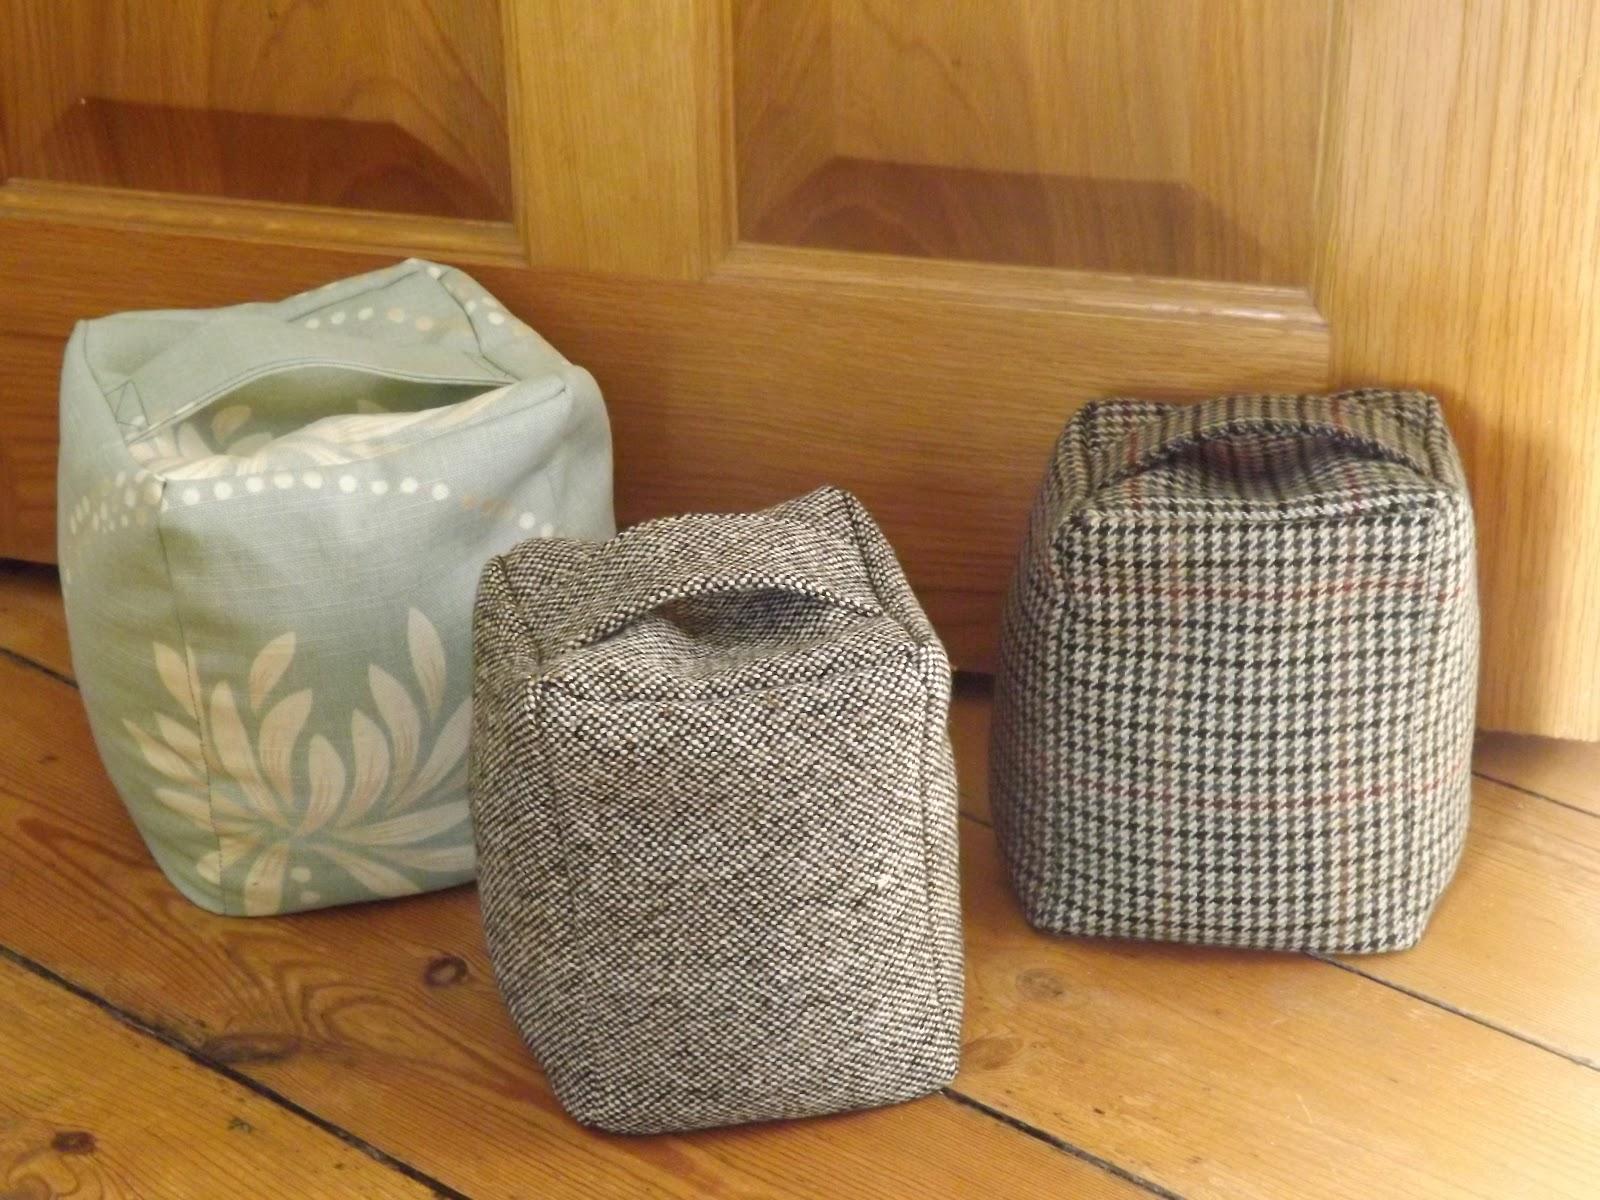 me and my shadow thrifty tweed door stop tutorial. Black Bedroom Furniture Sets. Home Design Ideas